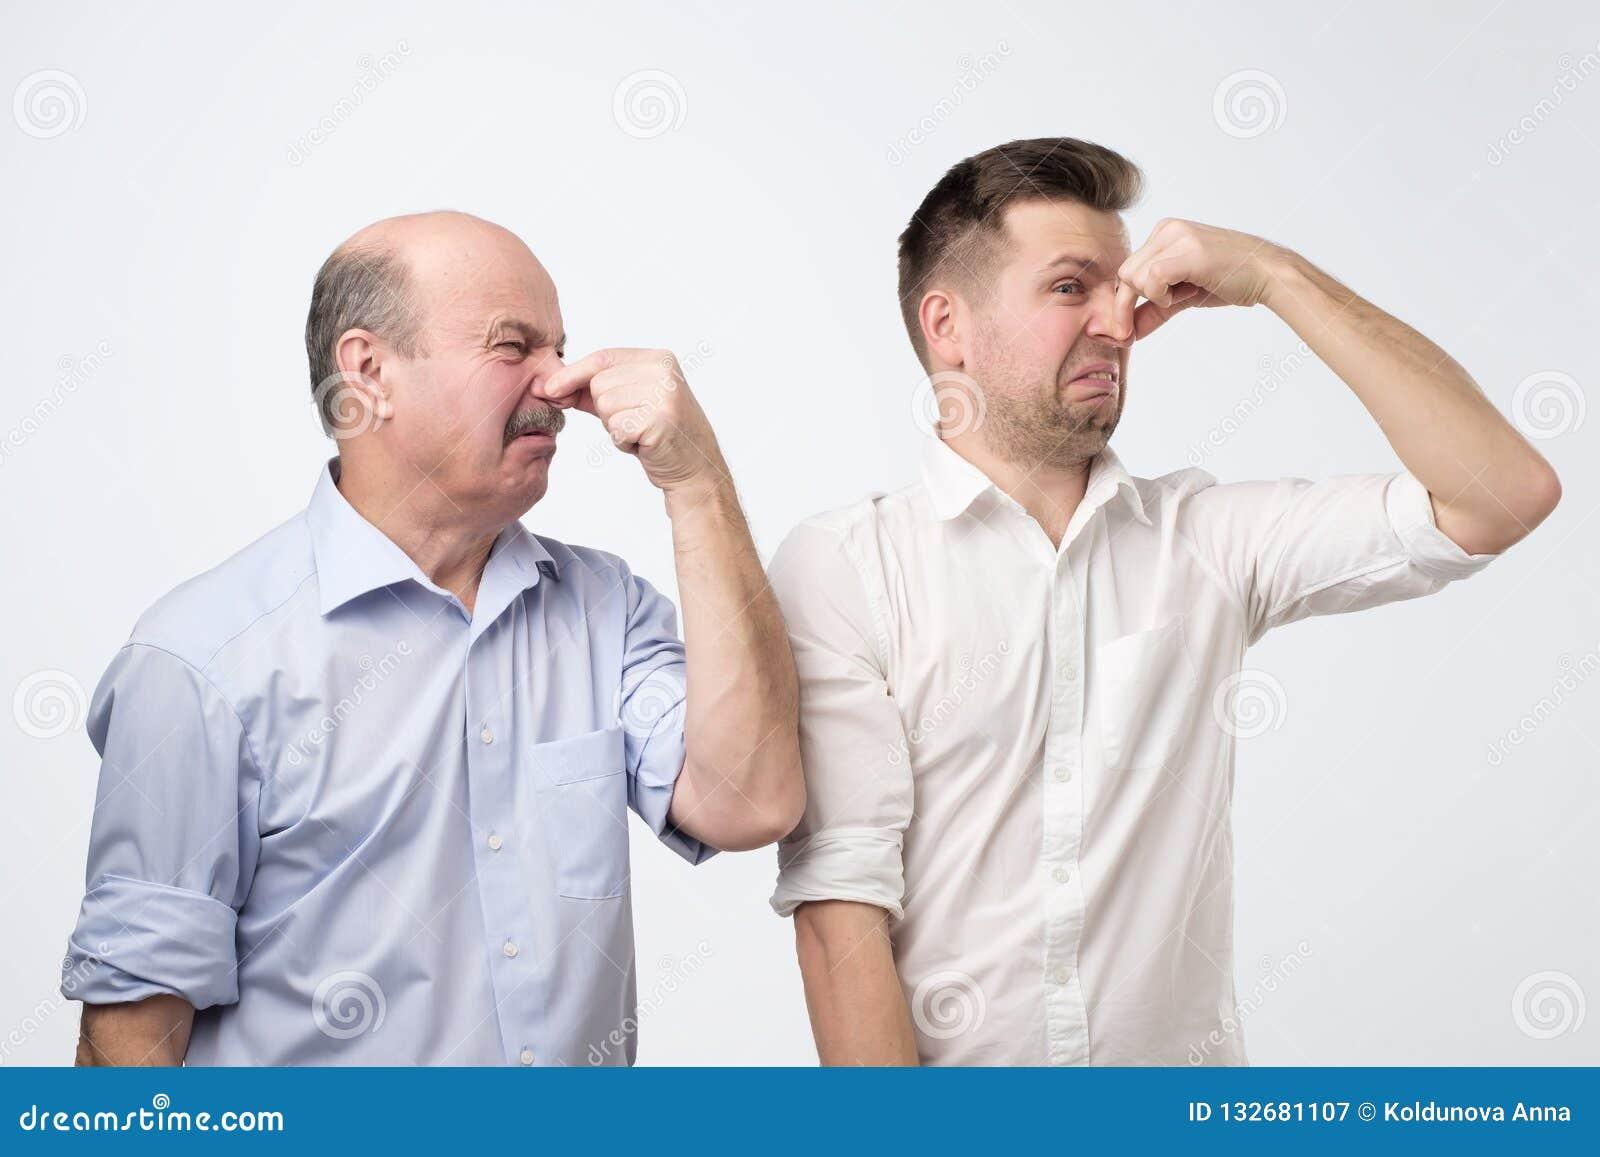 Dos hombres cubren sus narices debido a un mún olor